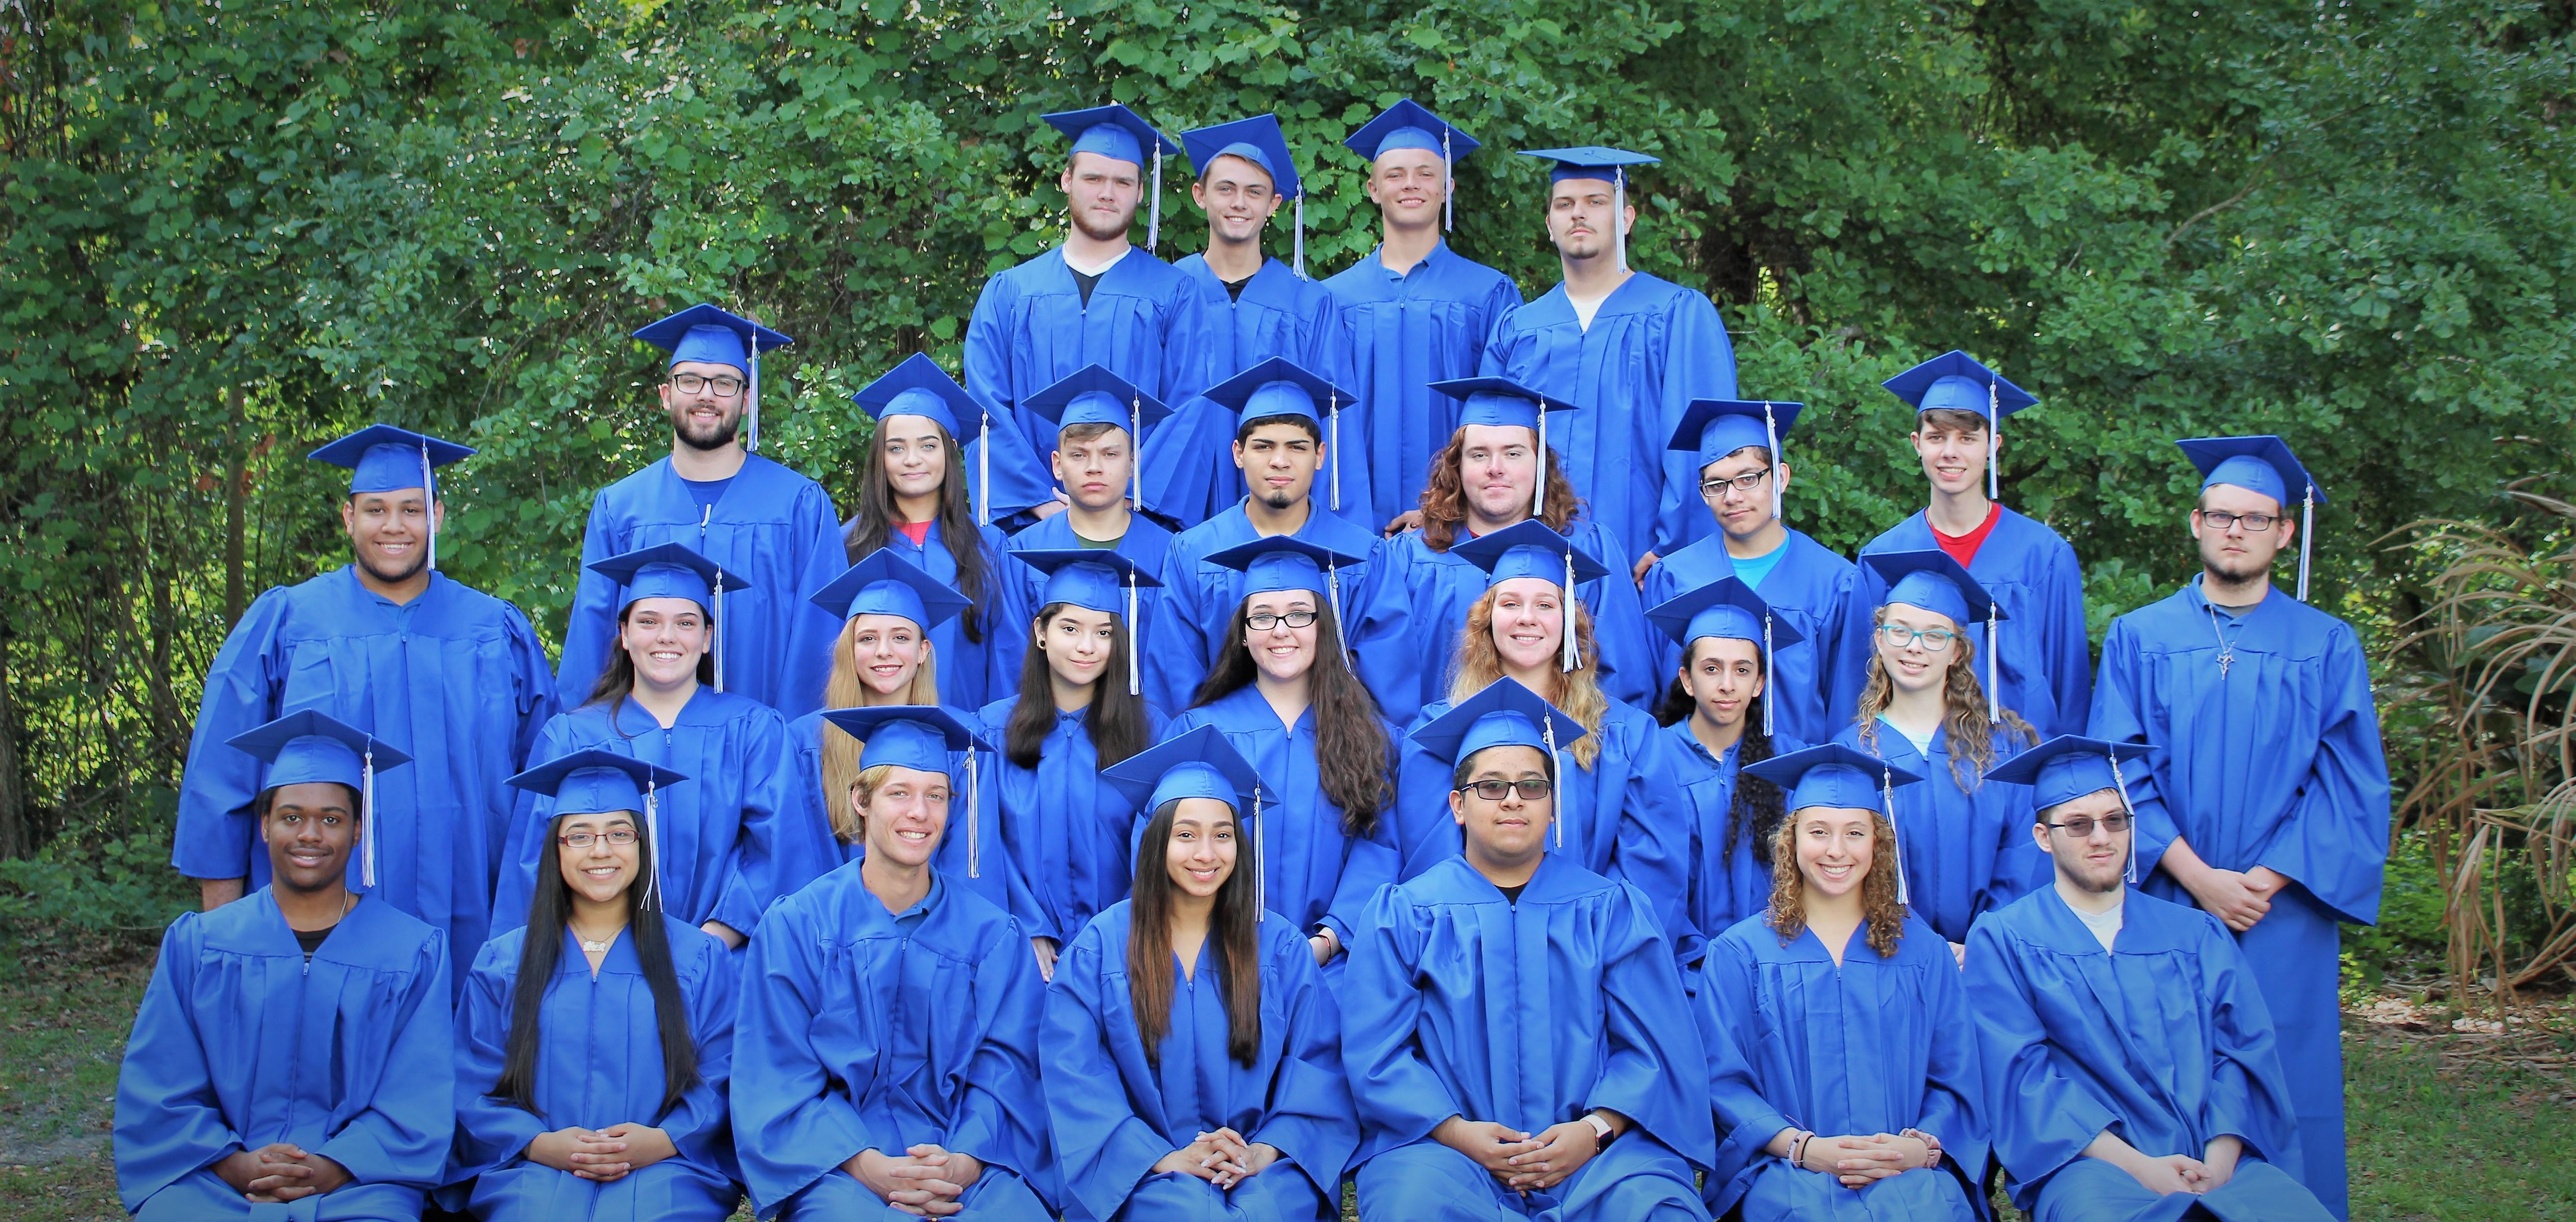 2018 Senior Class